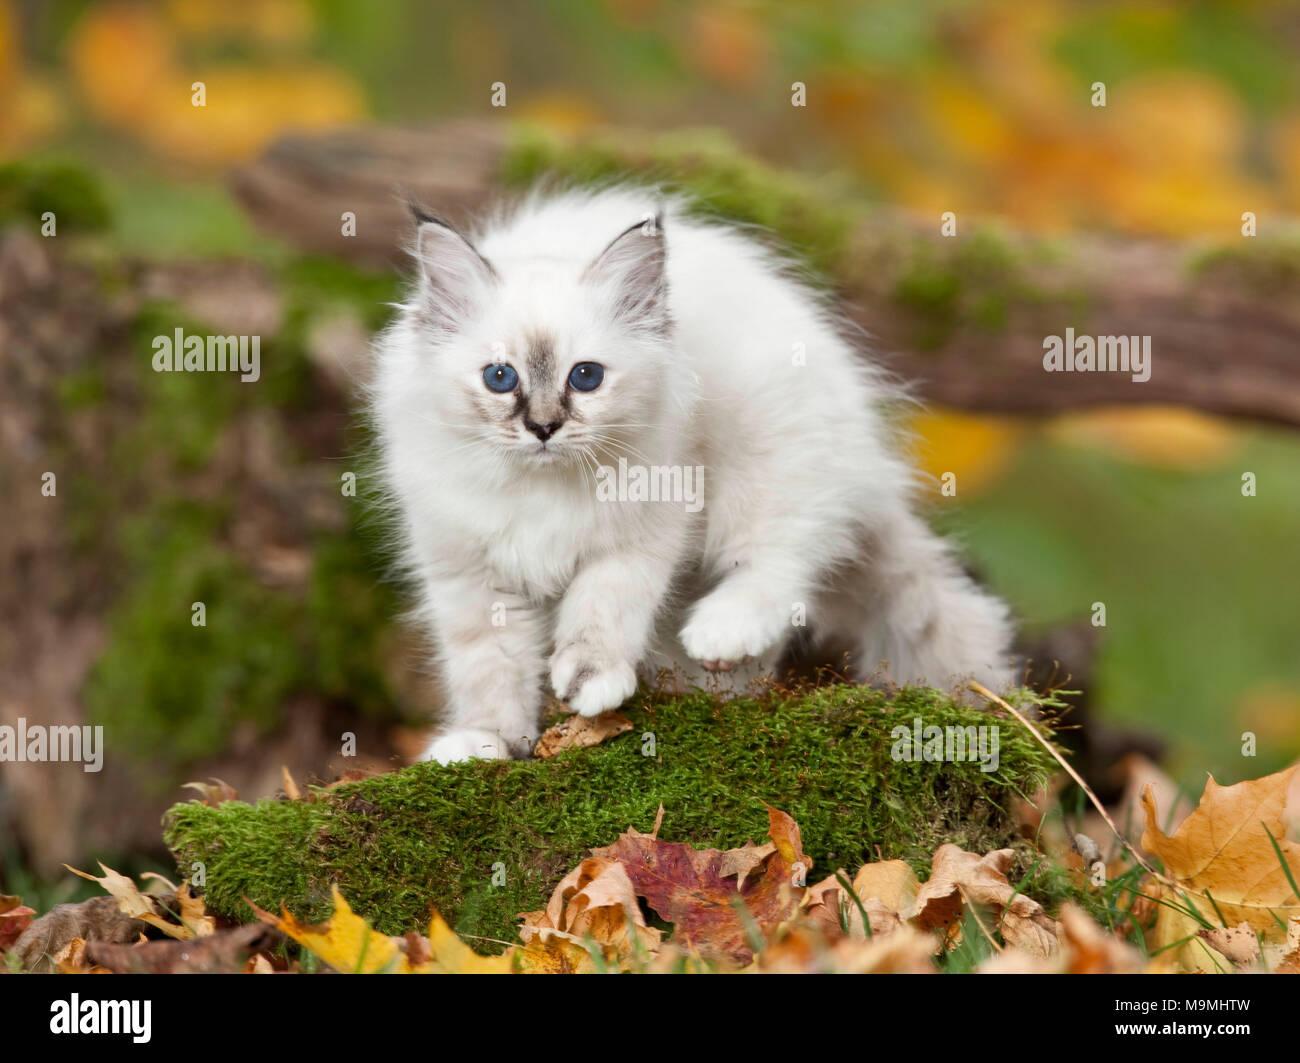 Sacred Birman. Kitten walking on a mossy log. Germany - Stock Image